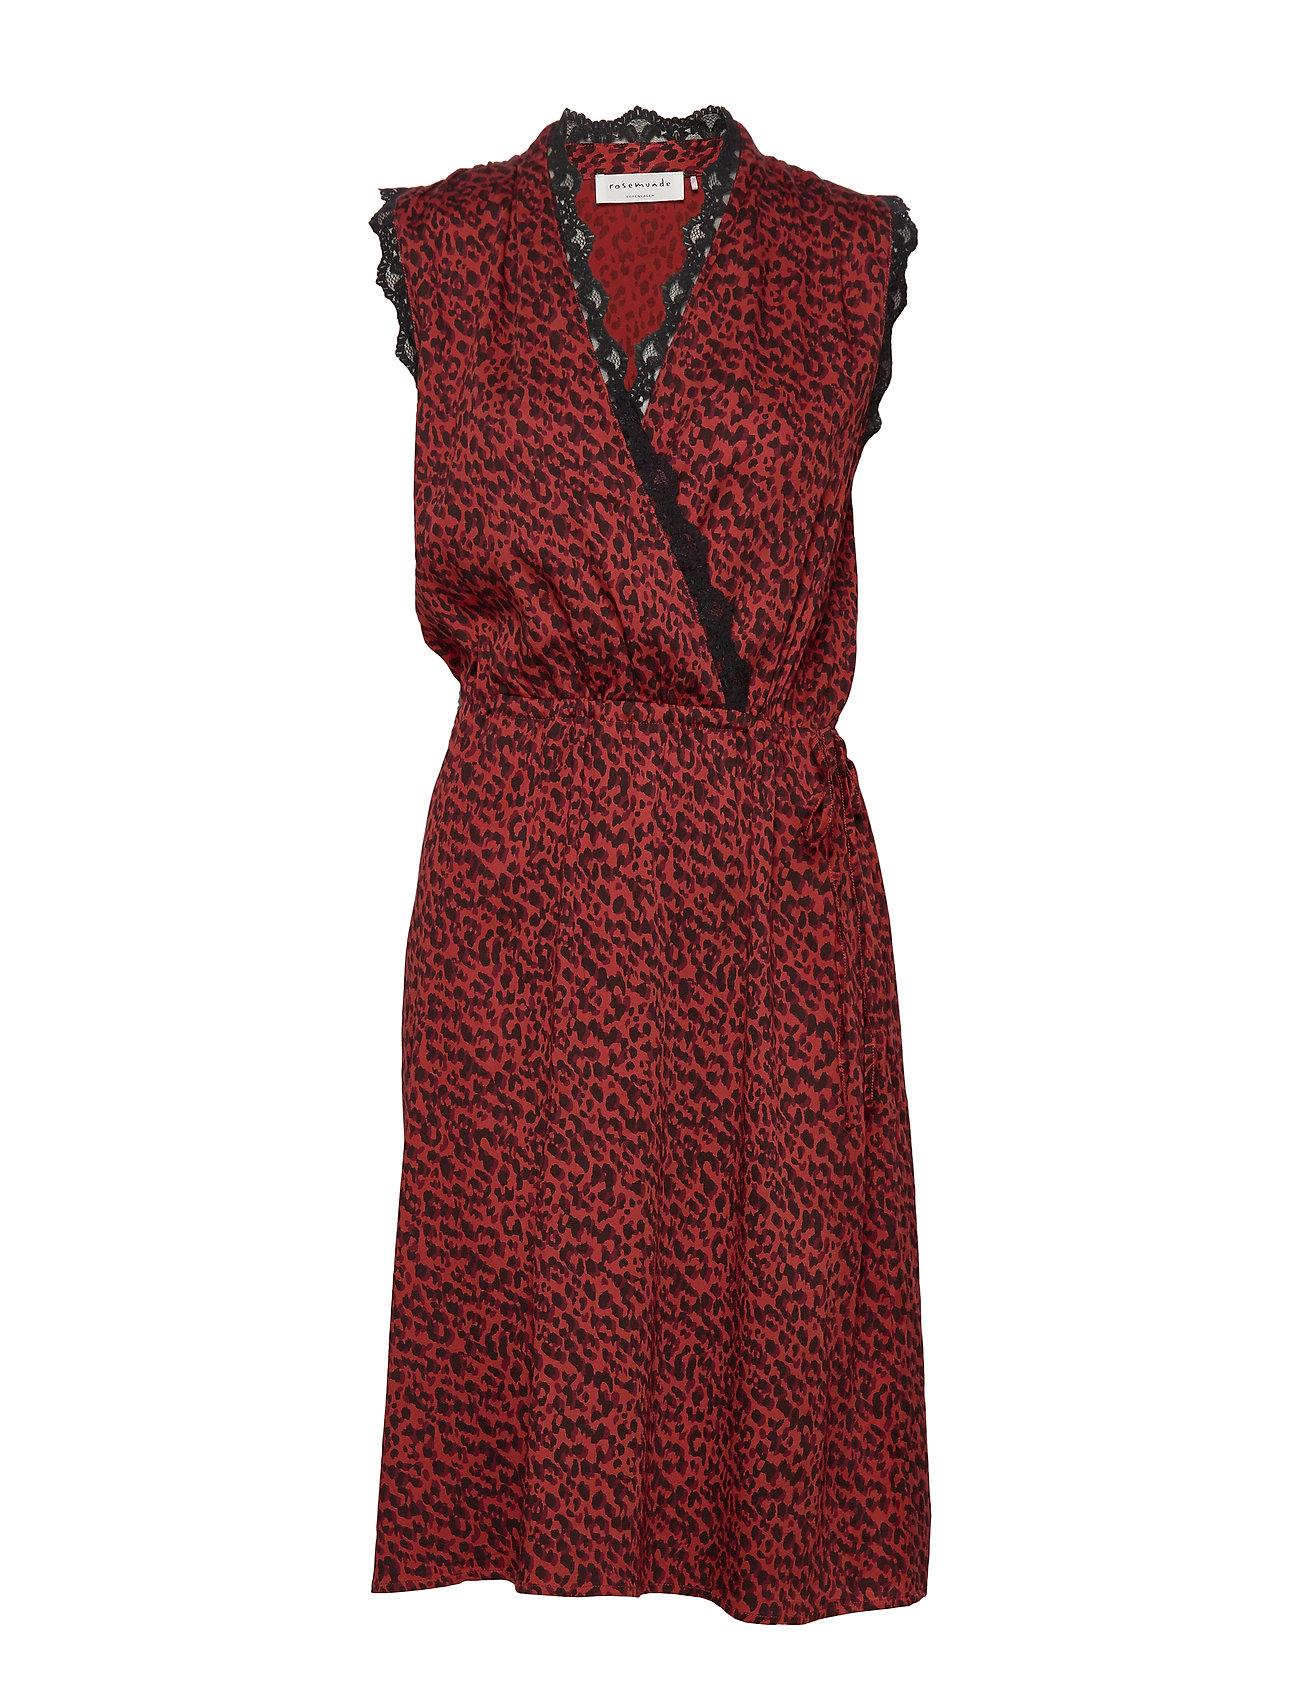 Rosemunde Dress - RED SHADOW LEOPARD PRINT